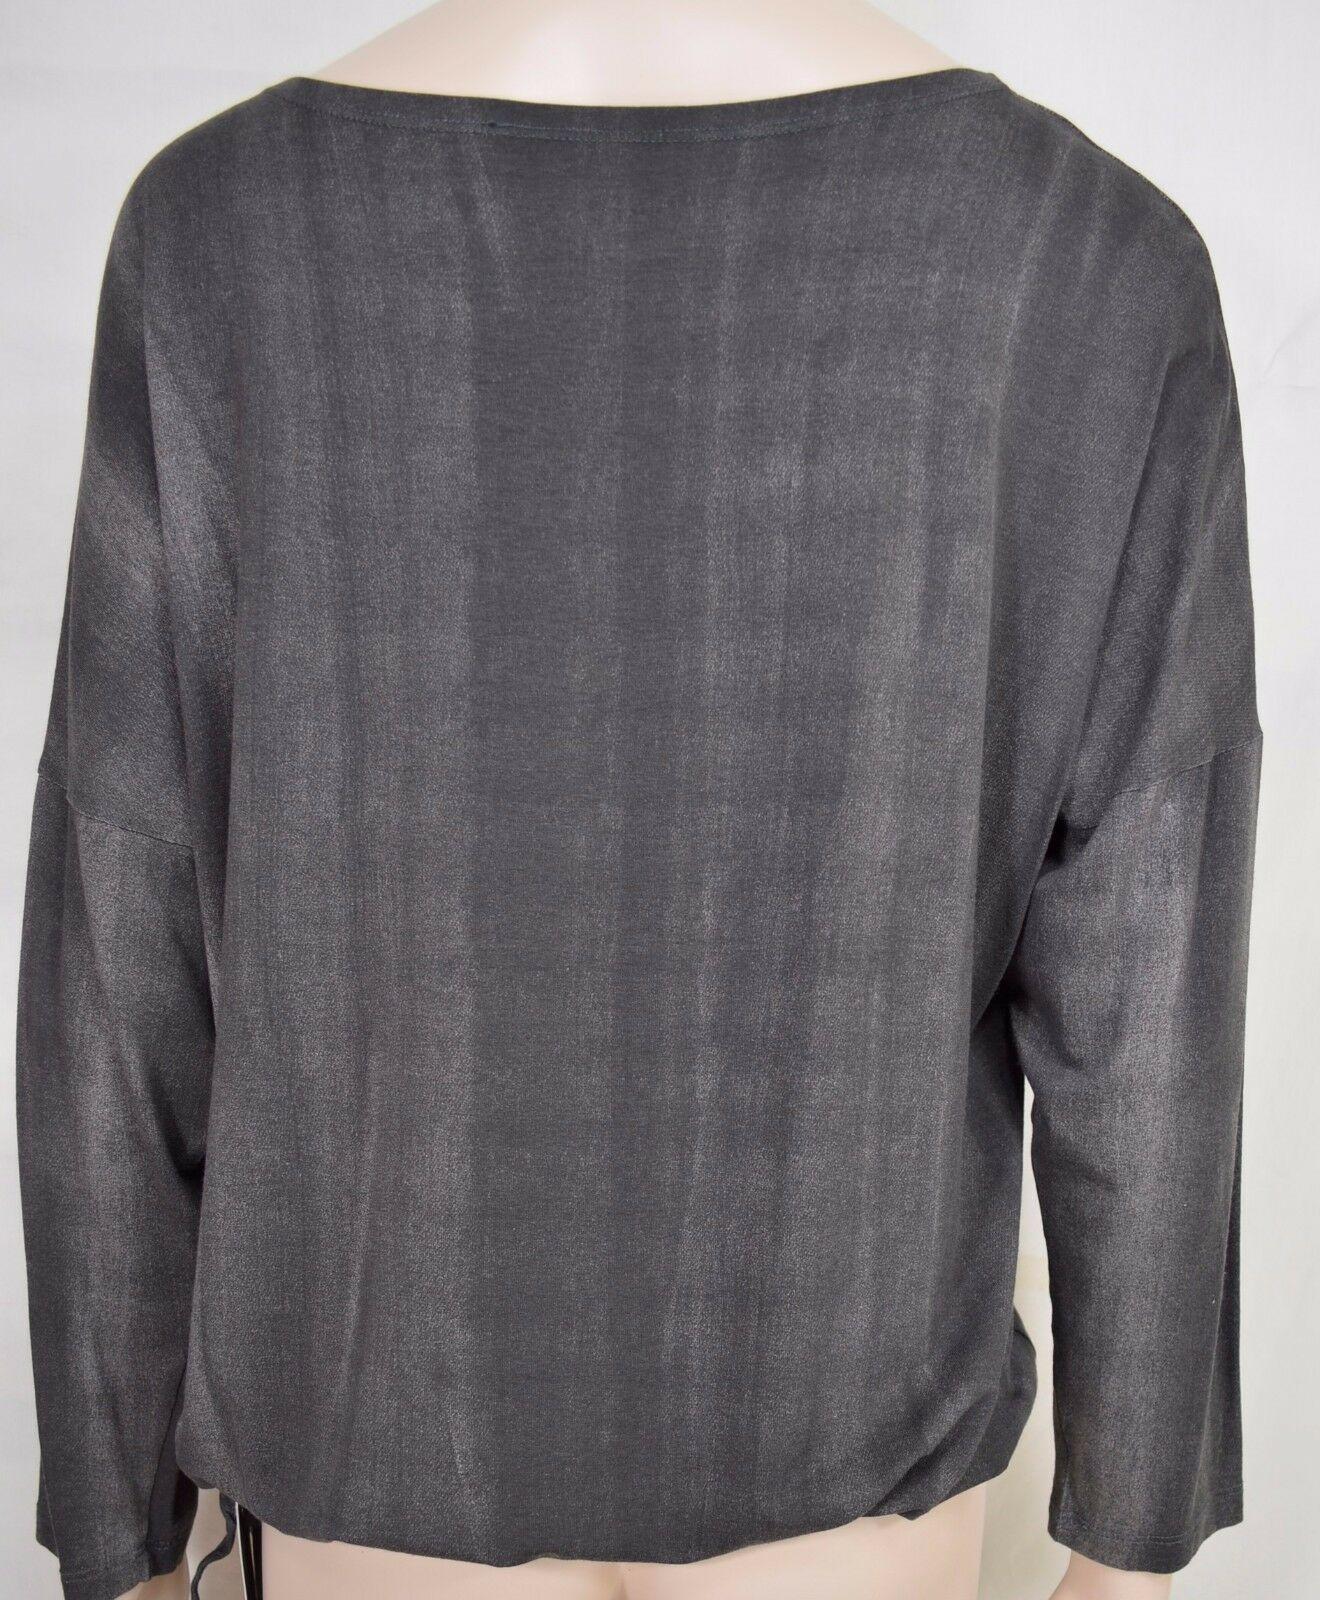 Matti Mamane top SZ M NWT dark gray drawstring waist scoop neck 3/4 sleeve new image 4